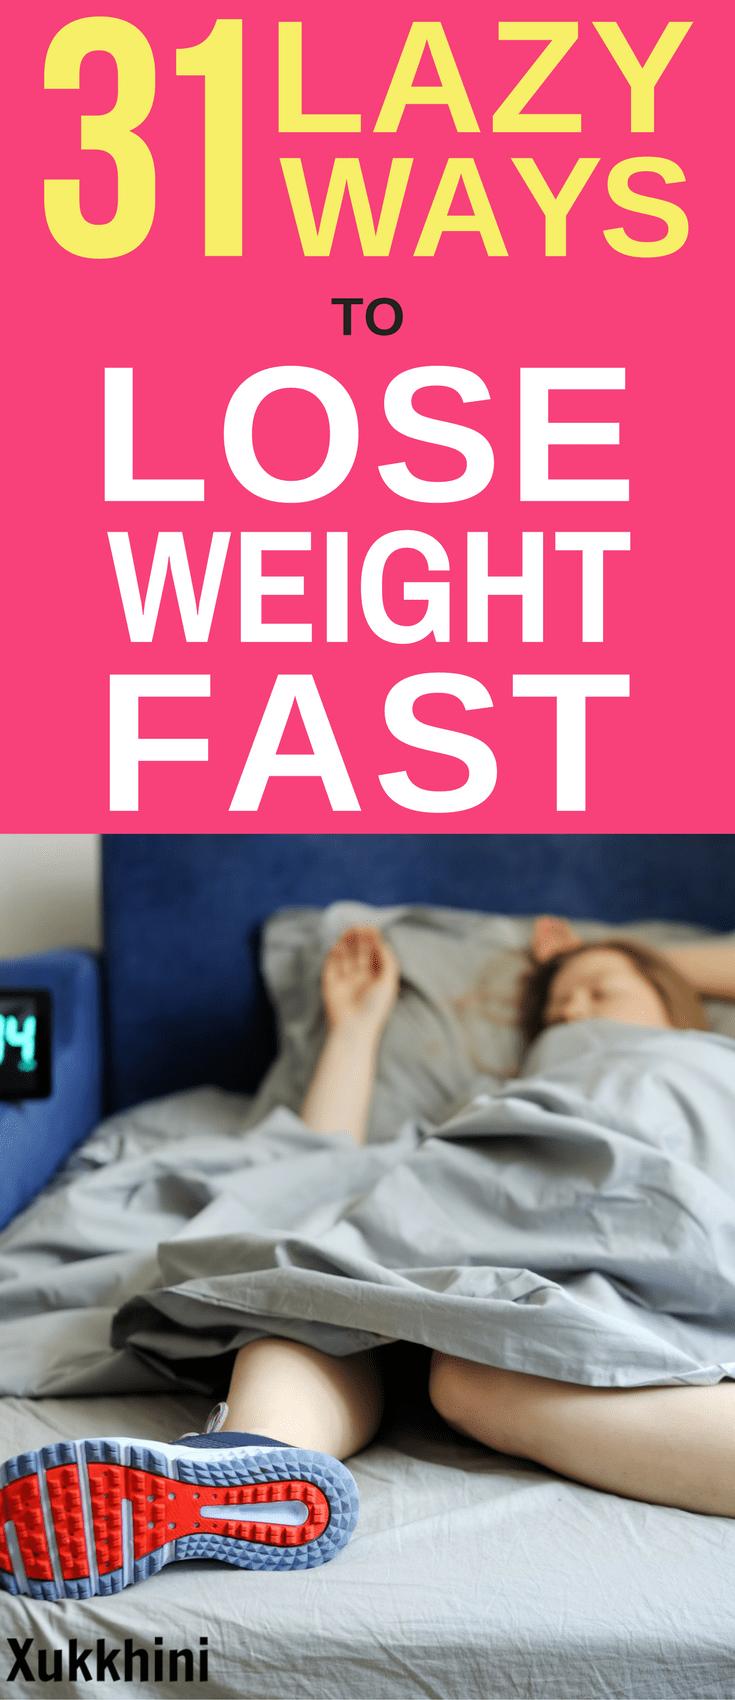 31 Lazy Ways to Lose Weight Fast | Operation Kill Fatty